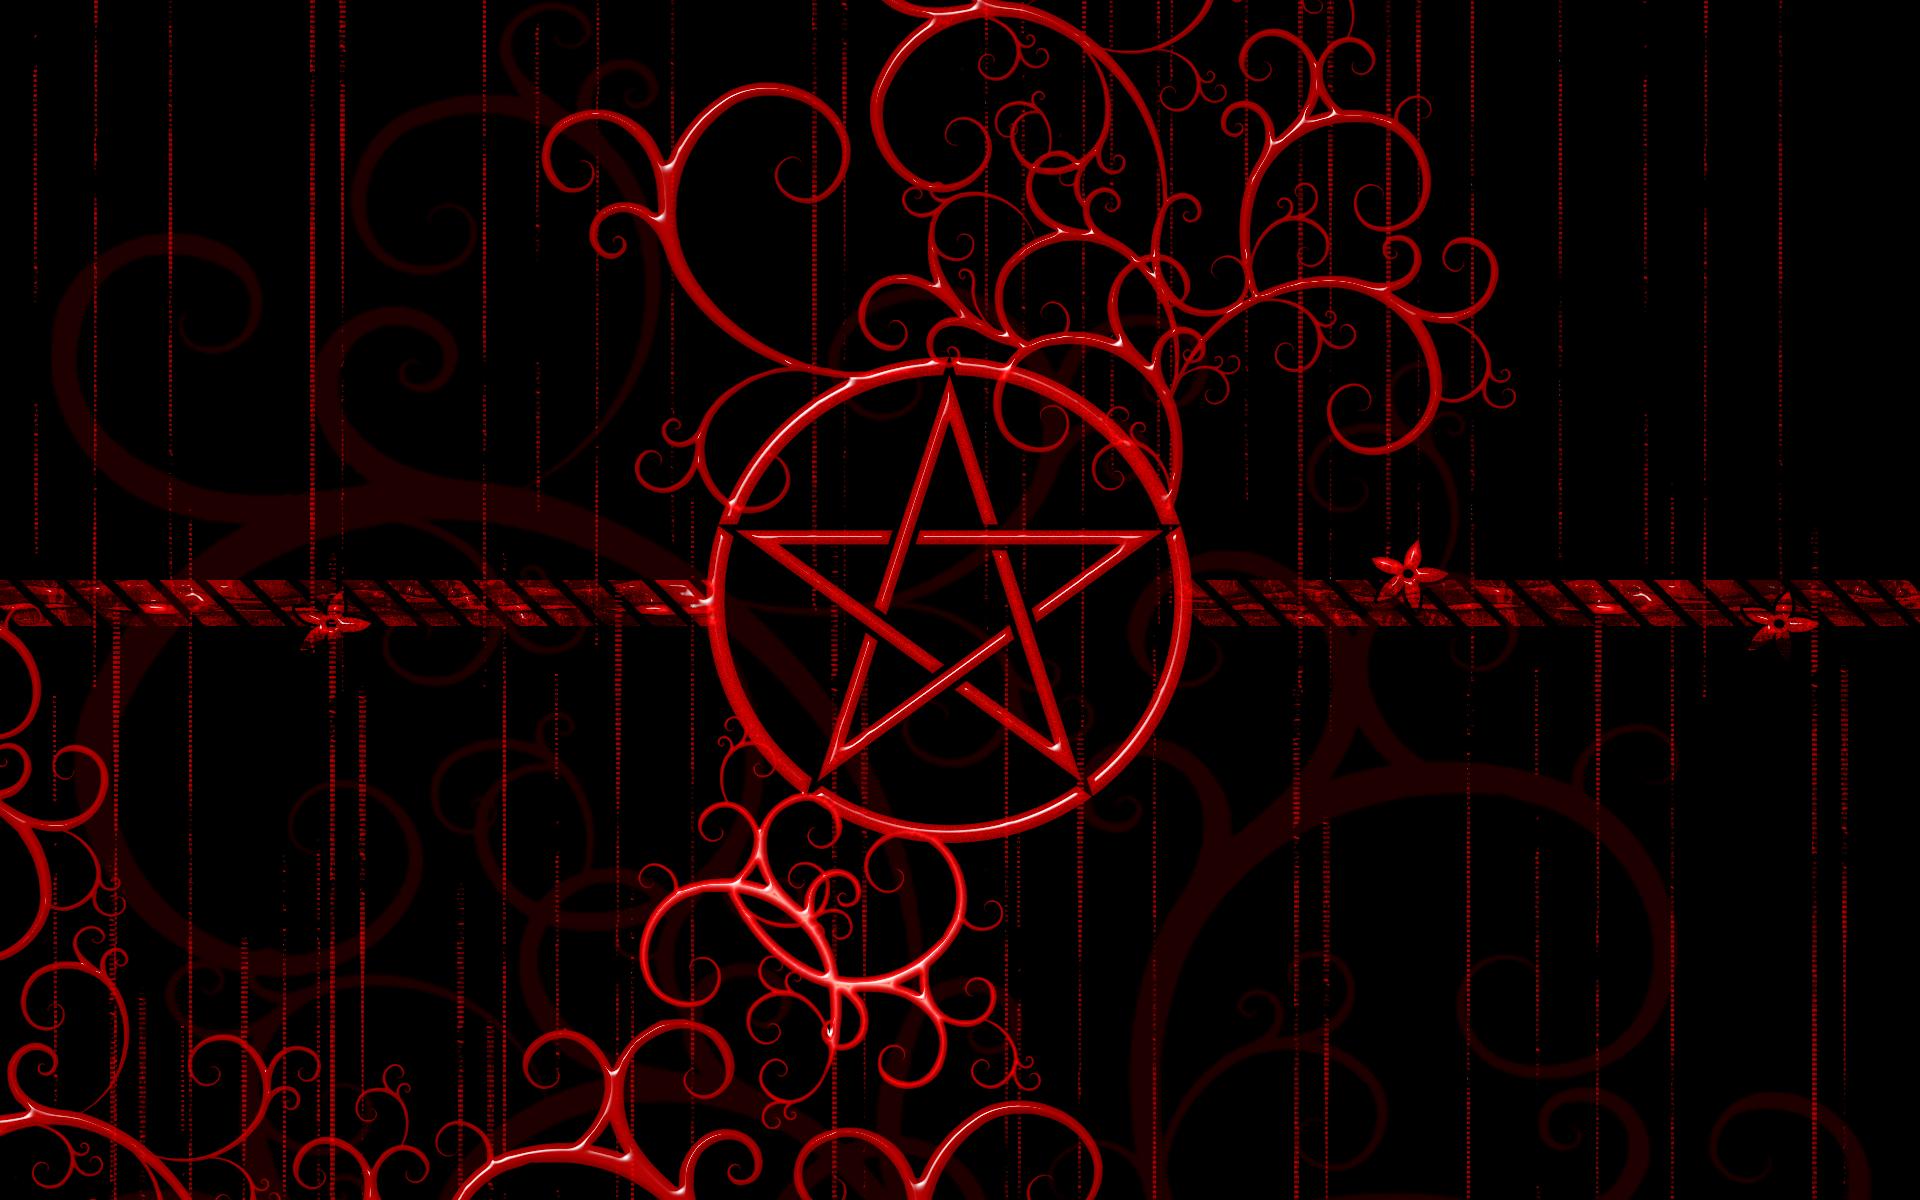 Occult Computer Wallpapers Desktop Backgrounds 1920x1200